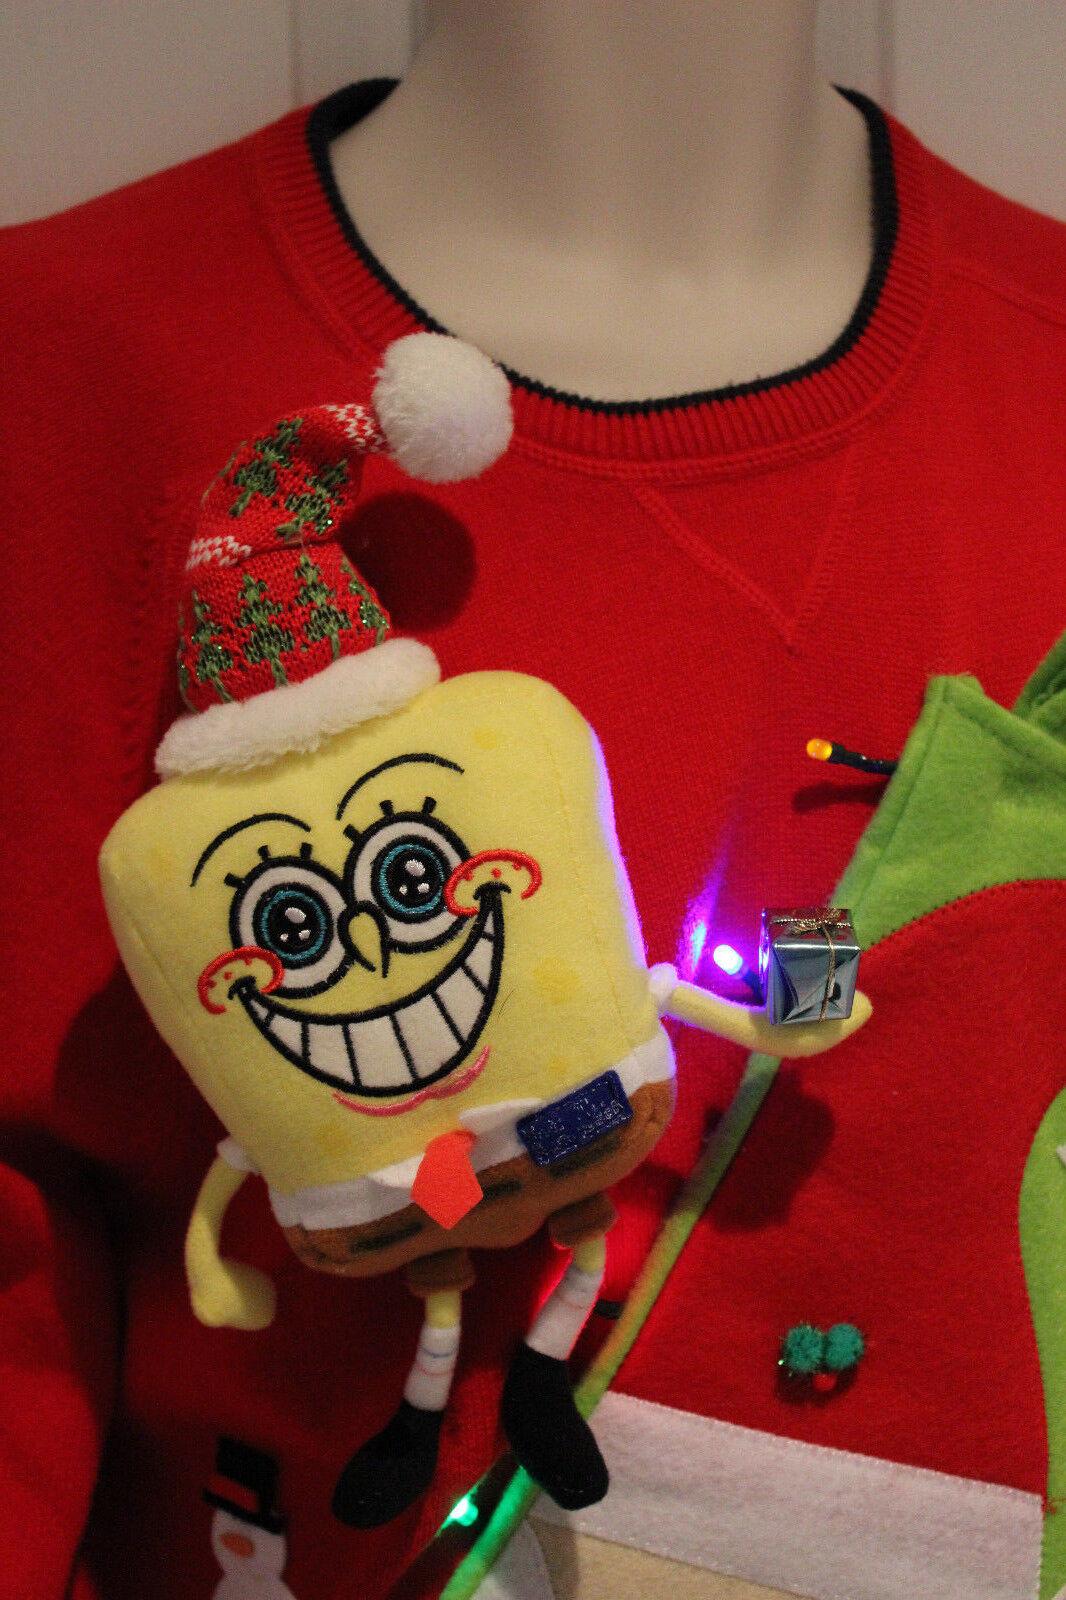 Herren Ugly Christmas Sweater Spongebob & SANTA Größe  XL 15D222  Lights UP